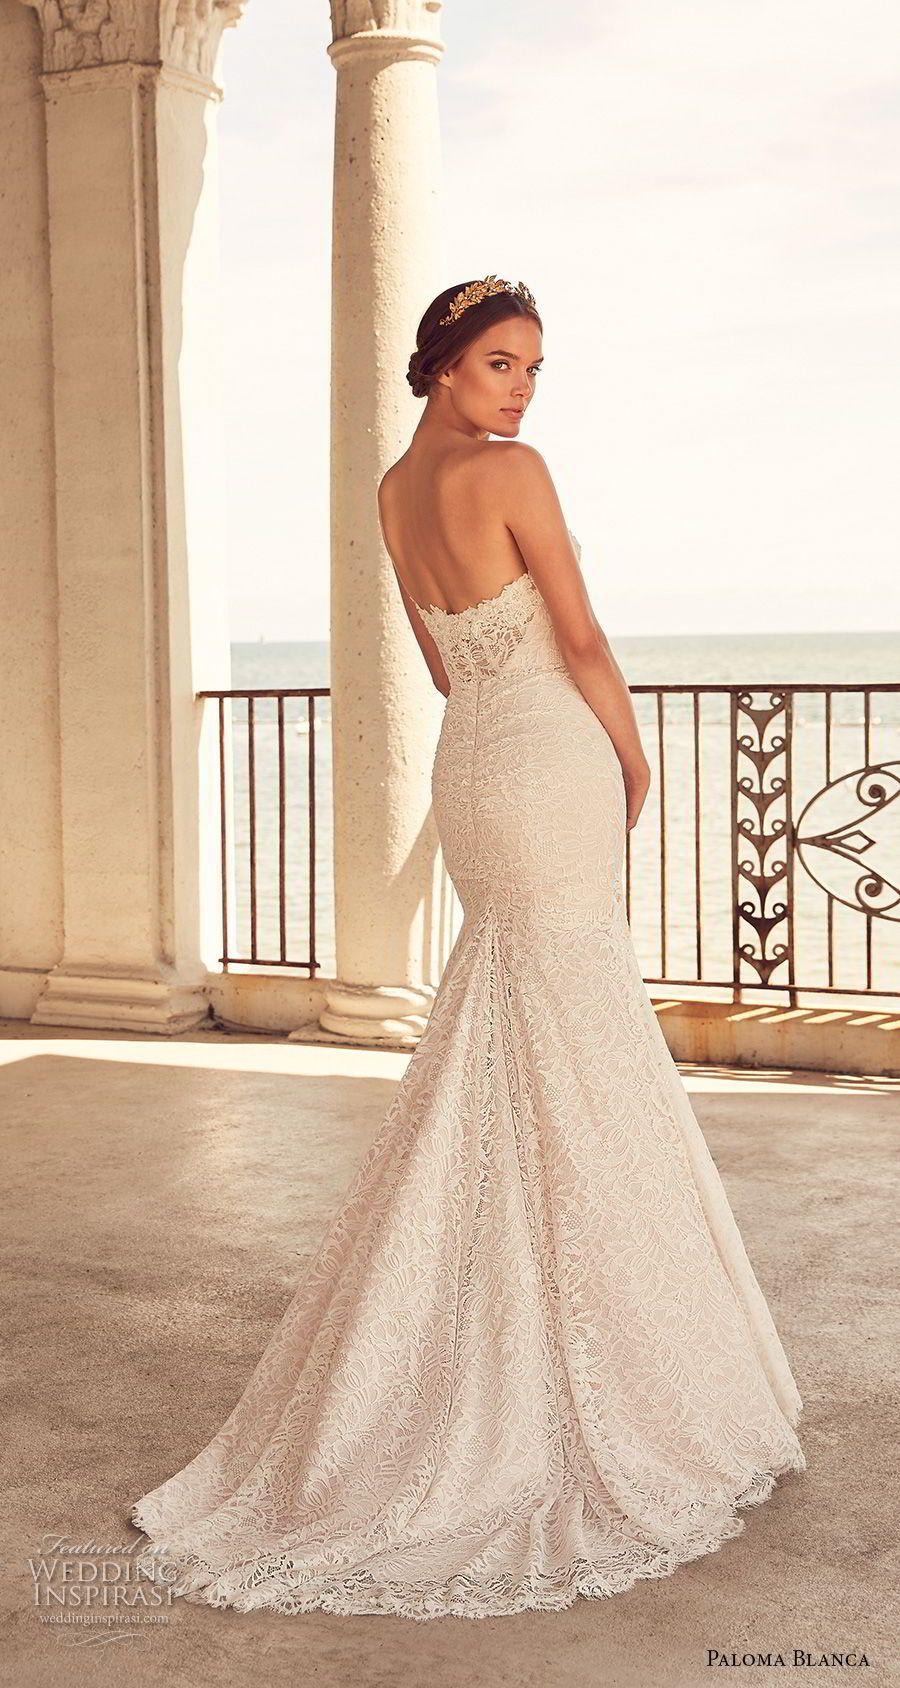 Paloma blanca spring wedding dresses wedding dress